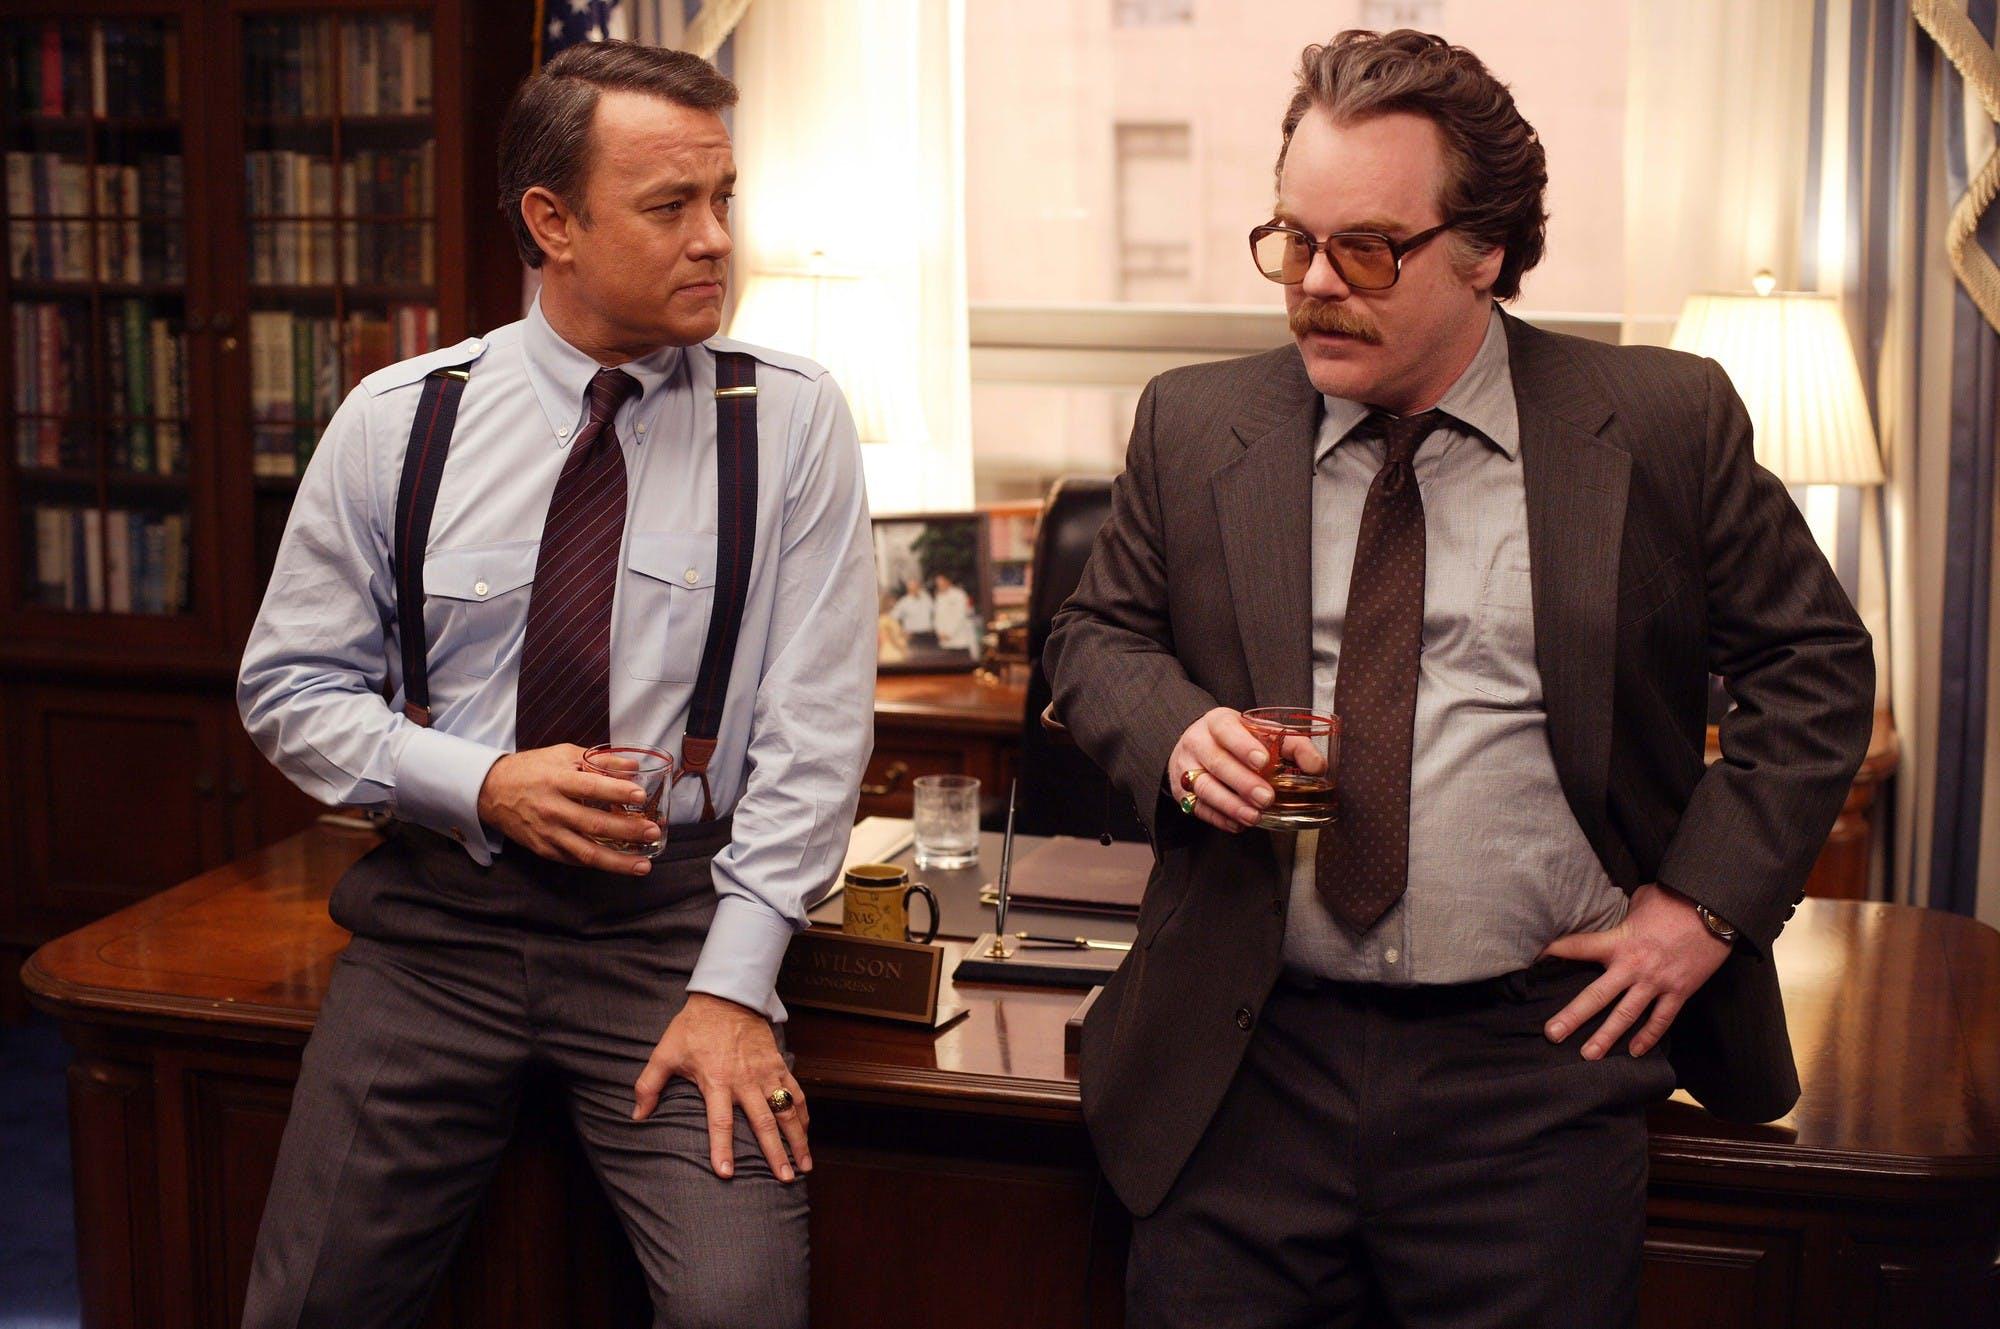 Tom Hanks as Charlie Wilson and Philip Seymour Hoffman as Gust Avrakotos.